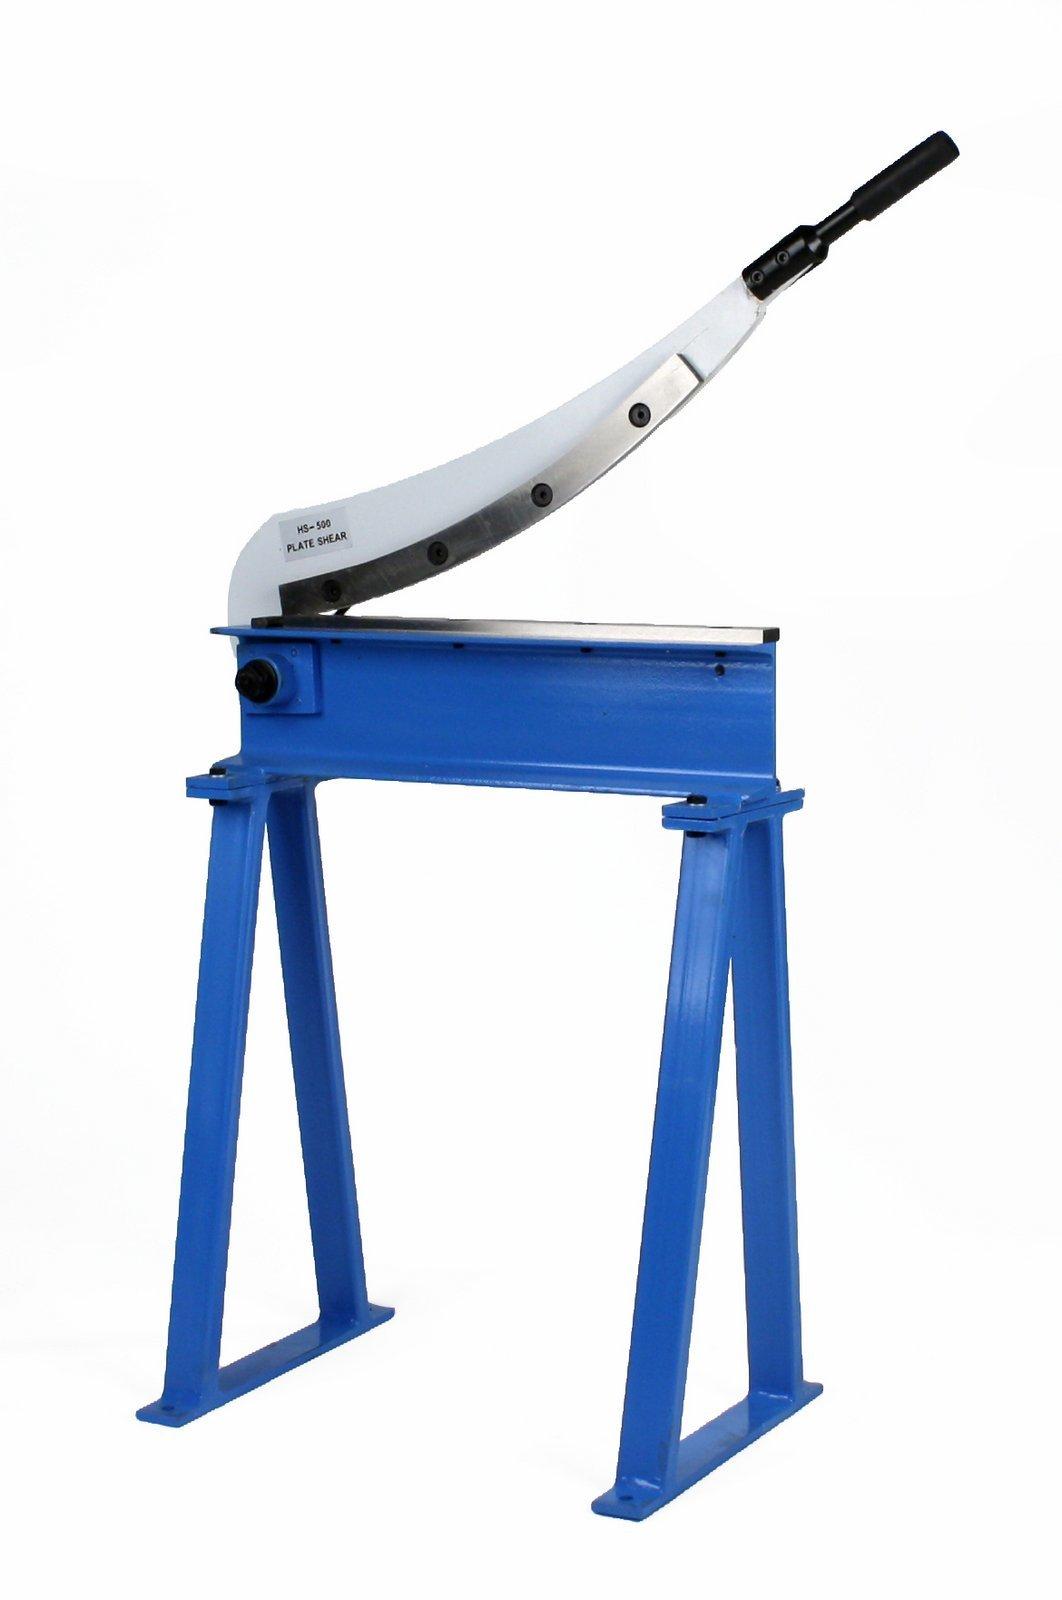 Erie Tools Manual Guillotine Shear 20'' x 16 Gauge Sheet Metal Plate Cutting Cutter w/ Stand